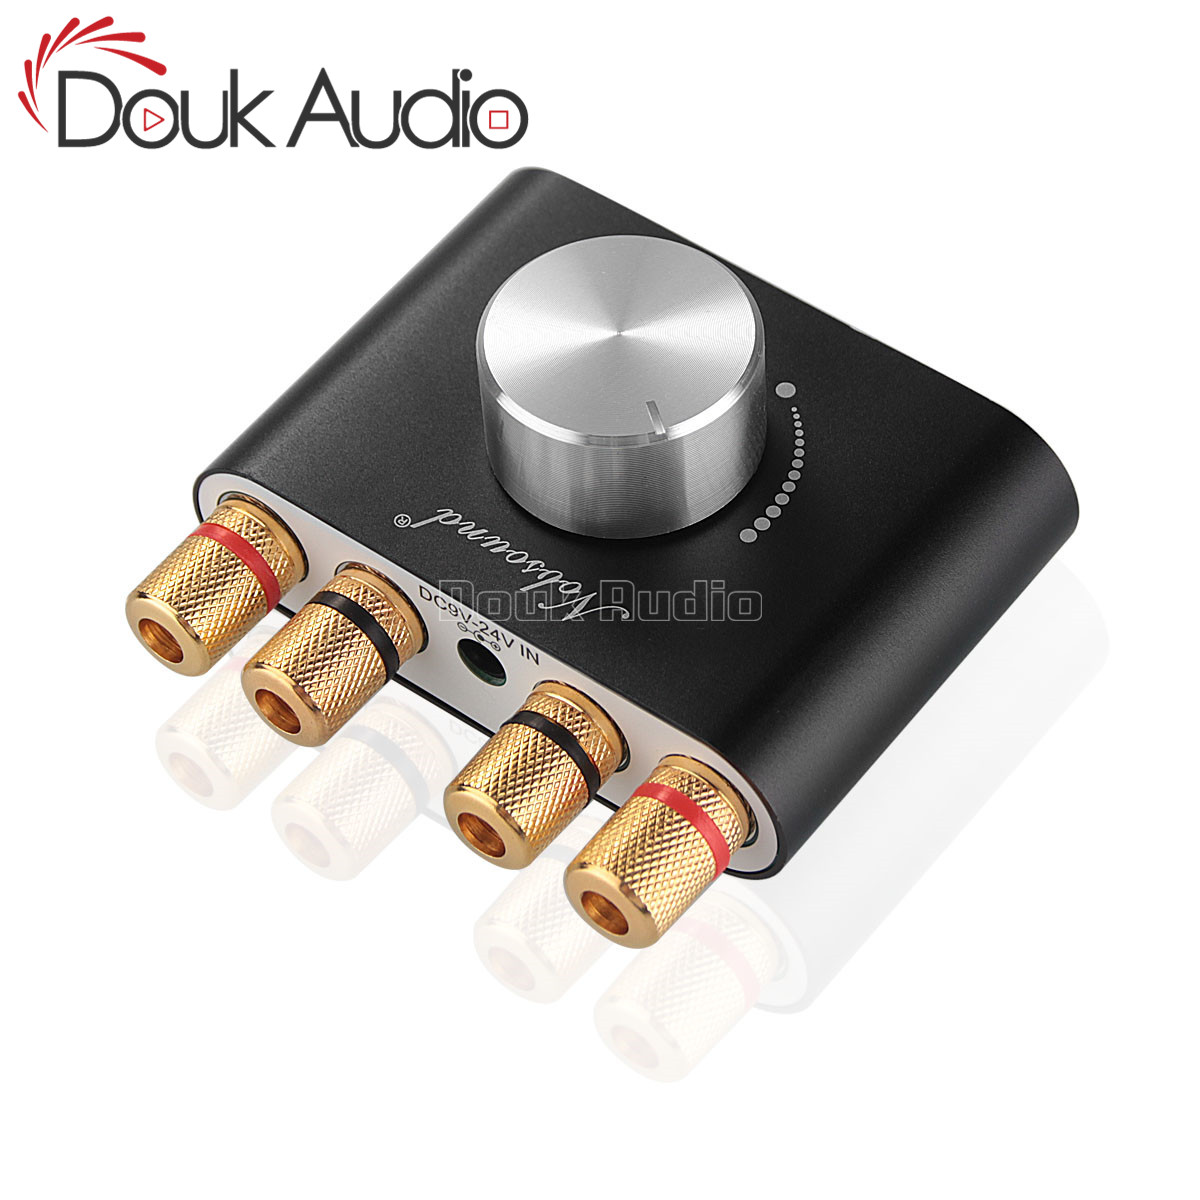 Douk Audio Mini Bluetooth 5.0 Digital Amplifier NS-01G Hi-Fi Stereo Home Audio TPA3116 Power Amplifier 100W